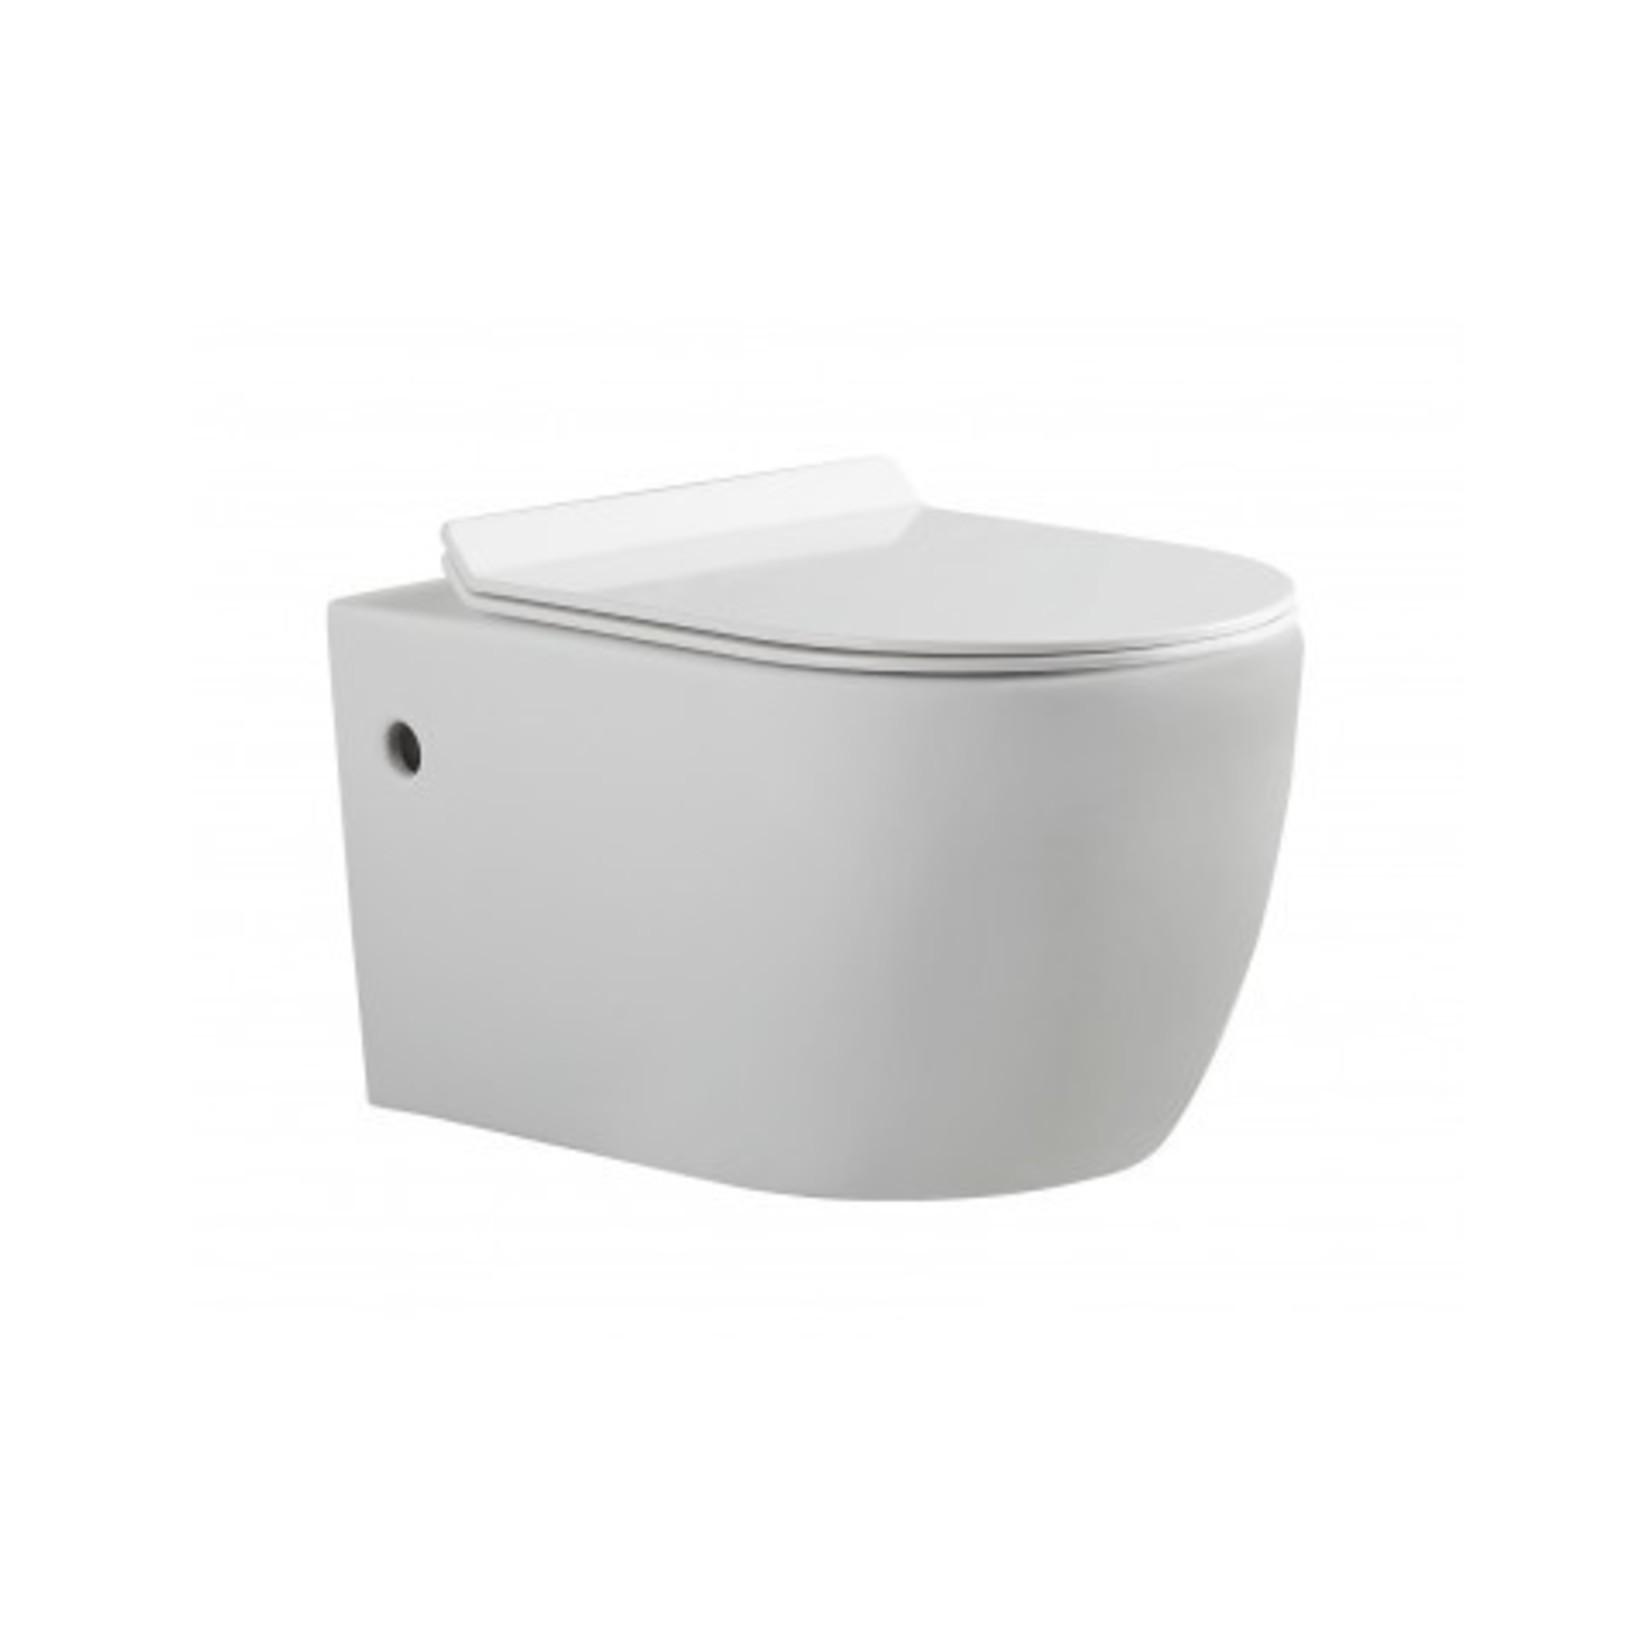 1/2 wall toilet